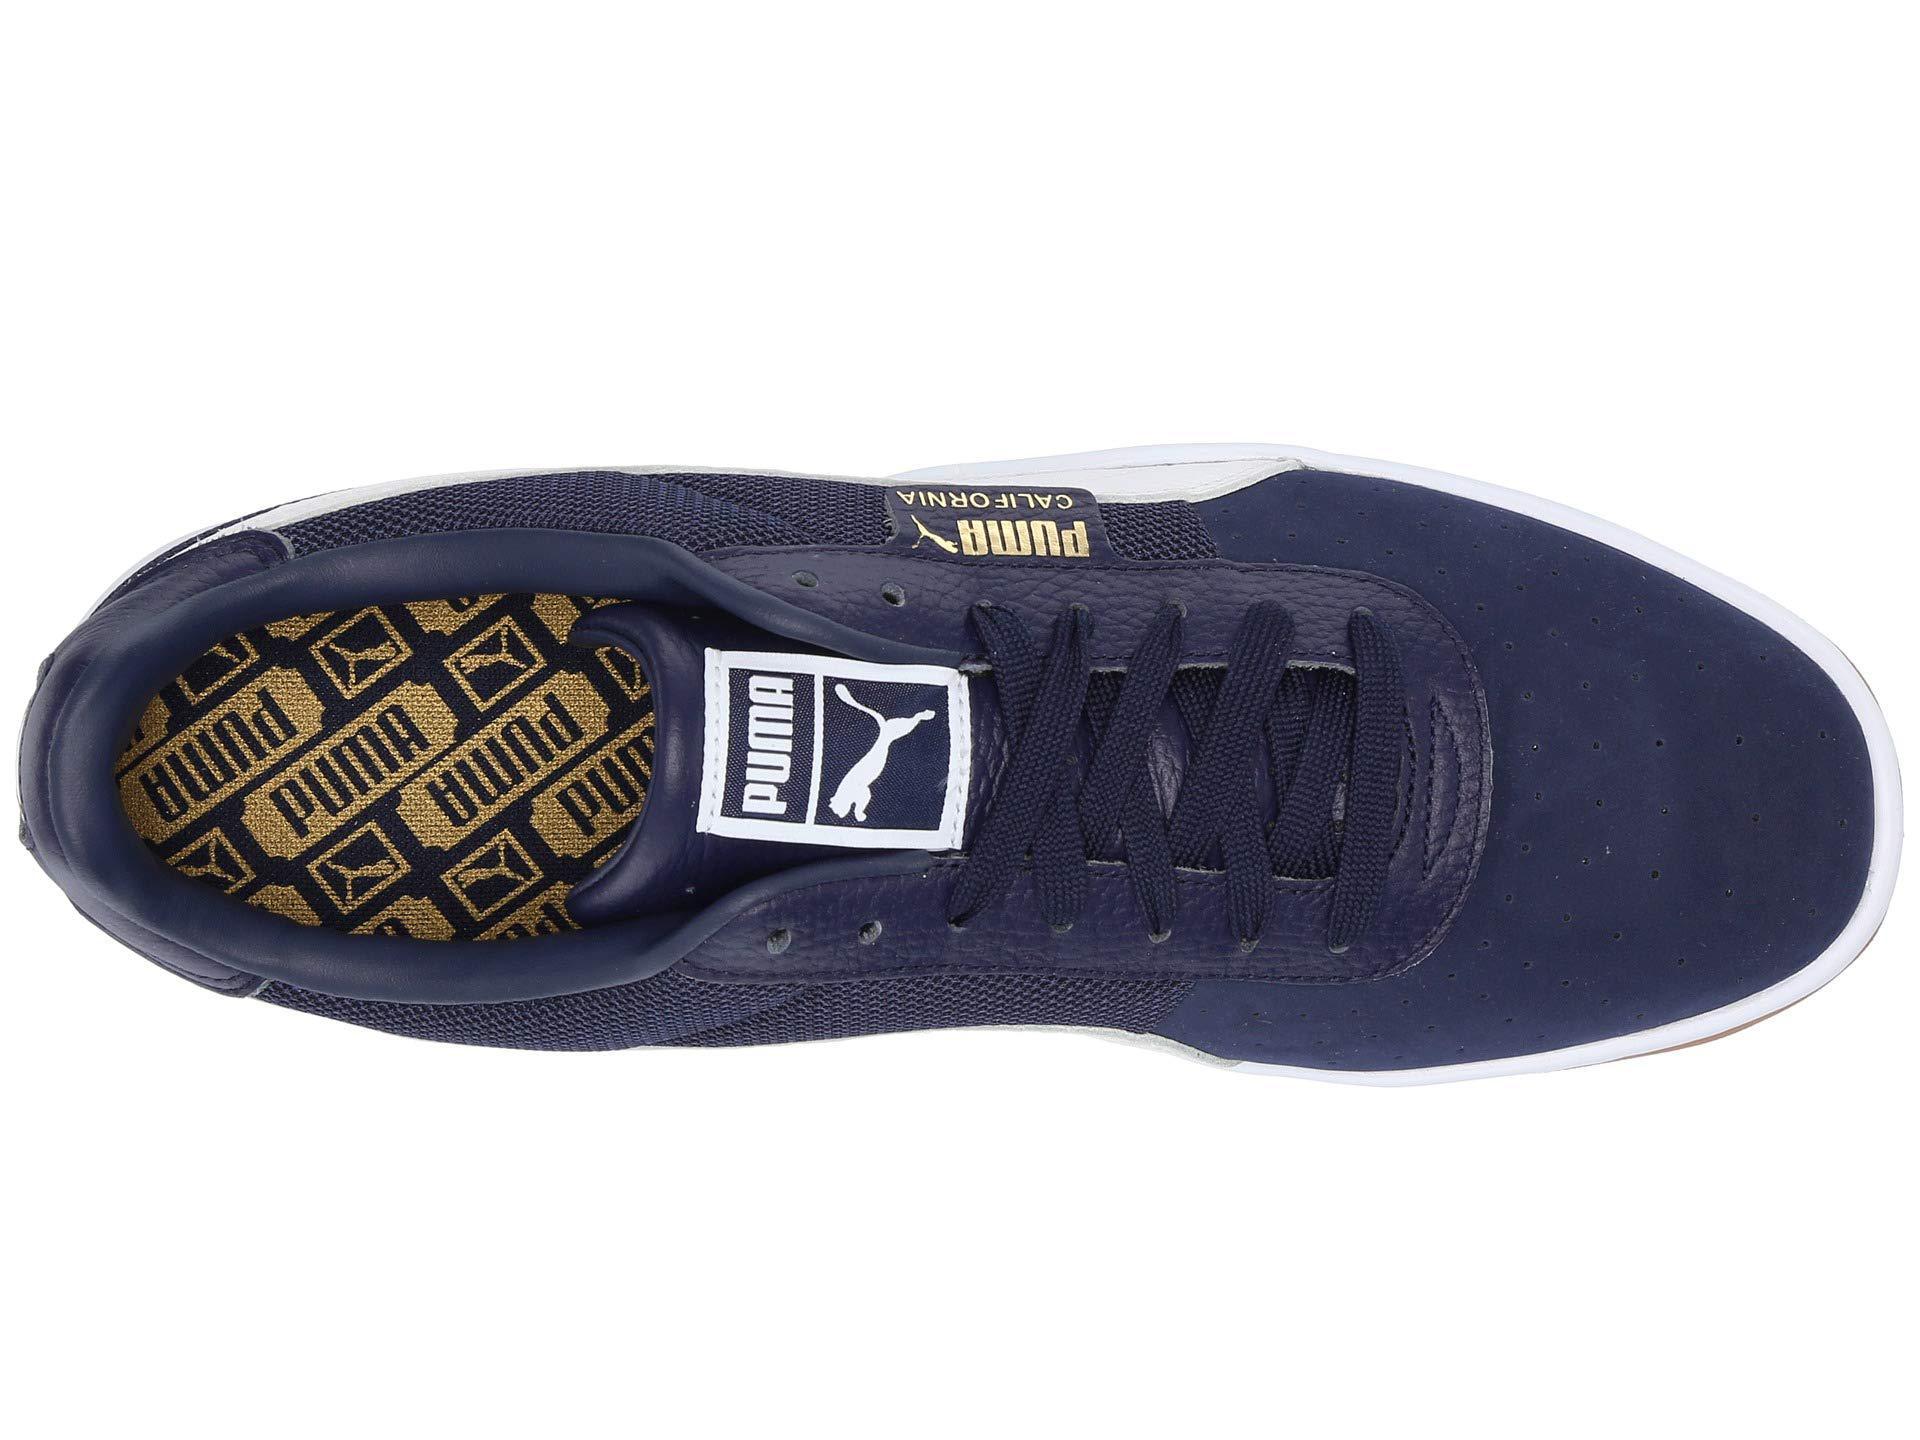 PUMA - California Casual ( White peacoat  White) Men s Shoes for Men -.  View fullscreen 294db4980